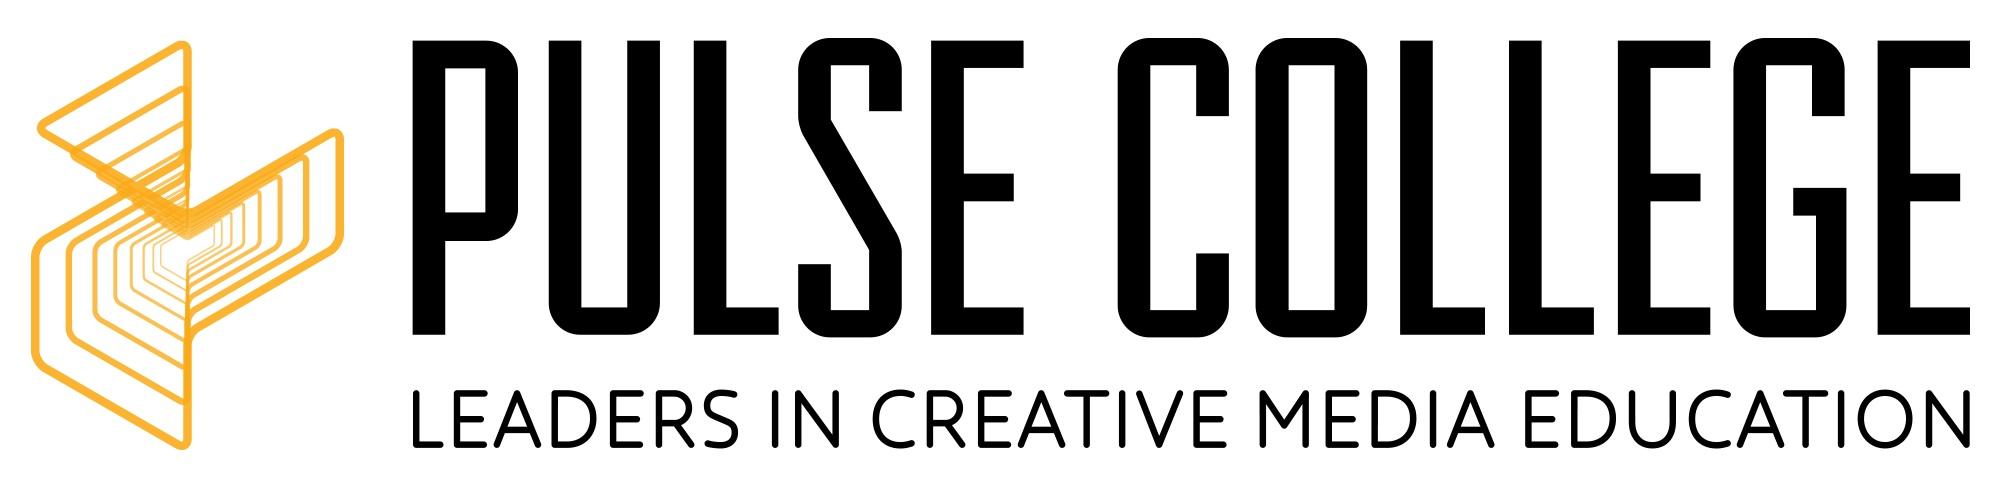 Pulse College logo